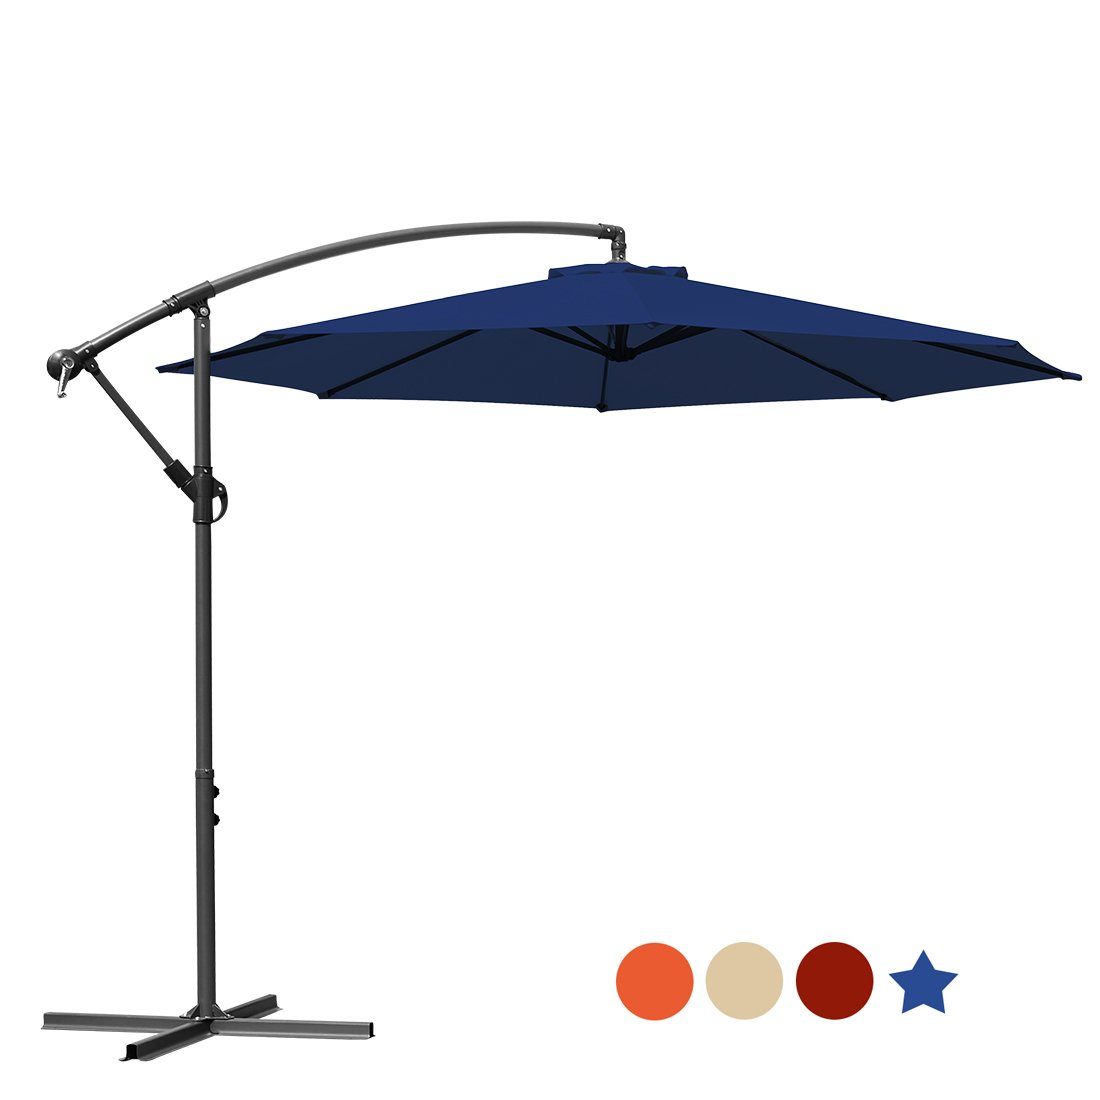 MASVIS Offset Umbrella 10 Ft Cantilever Patio Umbrella Outdoor Market Umbrellas Crank with Cross Base, 8 Ribs (10FT, Blue)